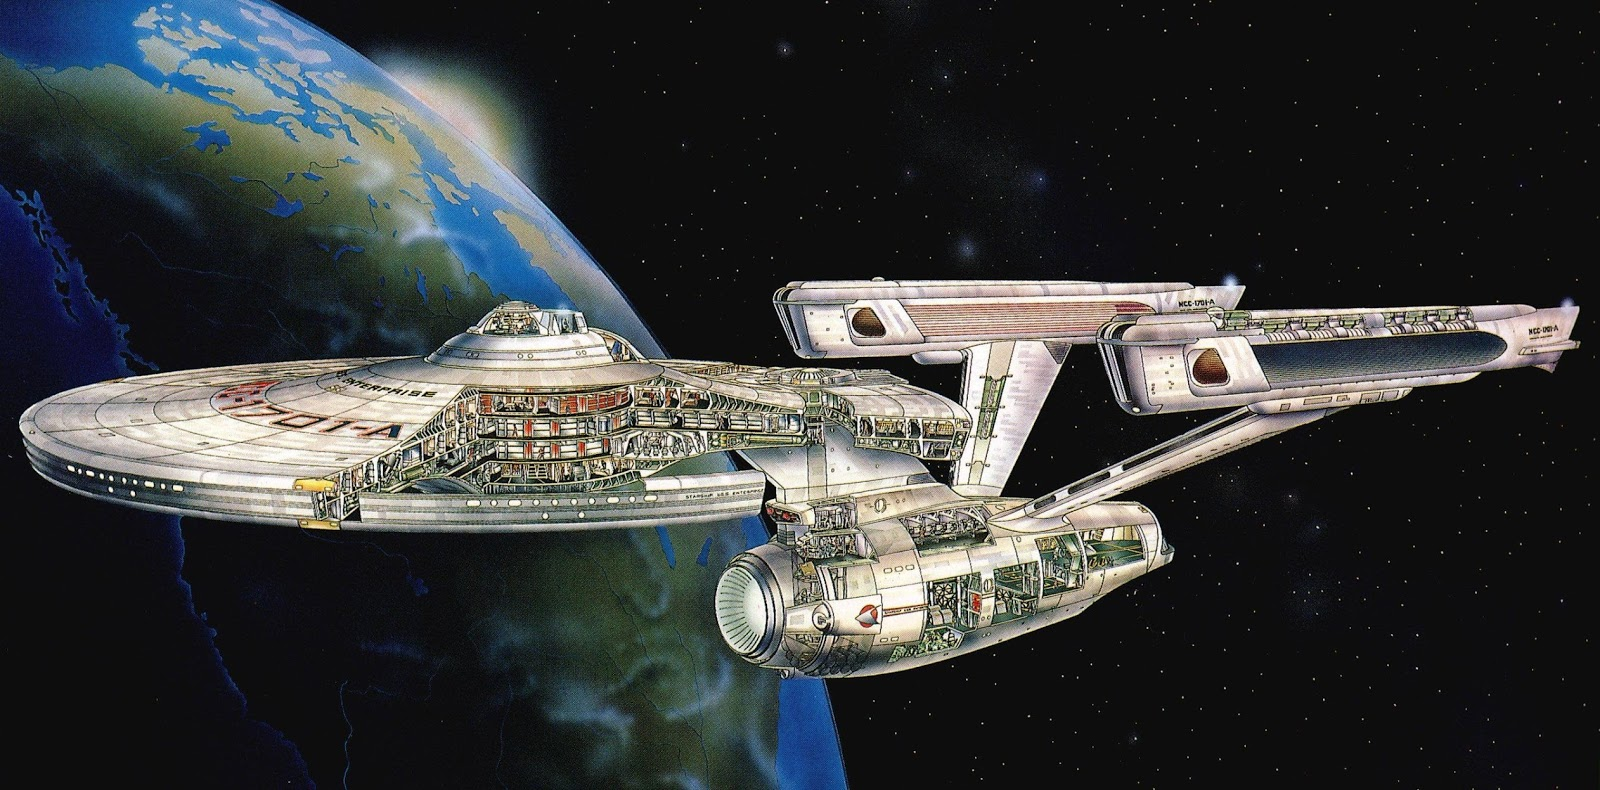 Uss Enterprise Diagram 1990 Mazda B2200 Radio Wiring The Wertzone Star Trek At 50 Ncc 1701 A